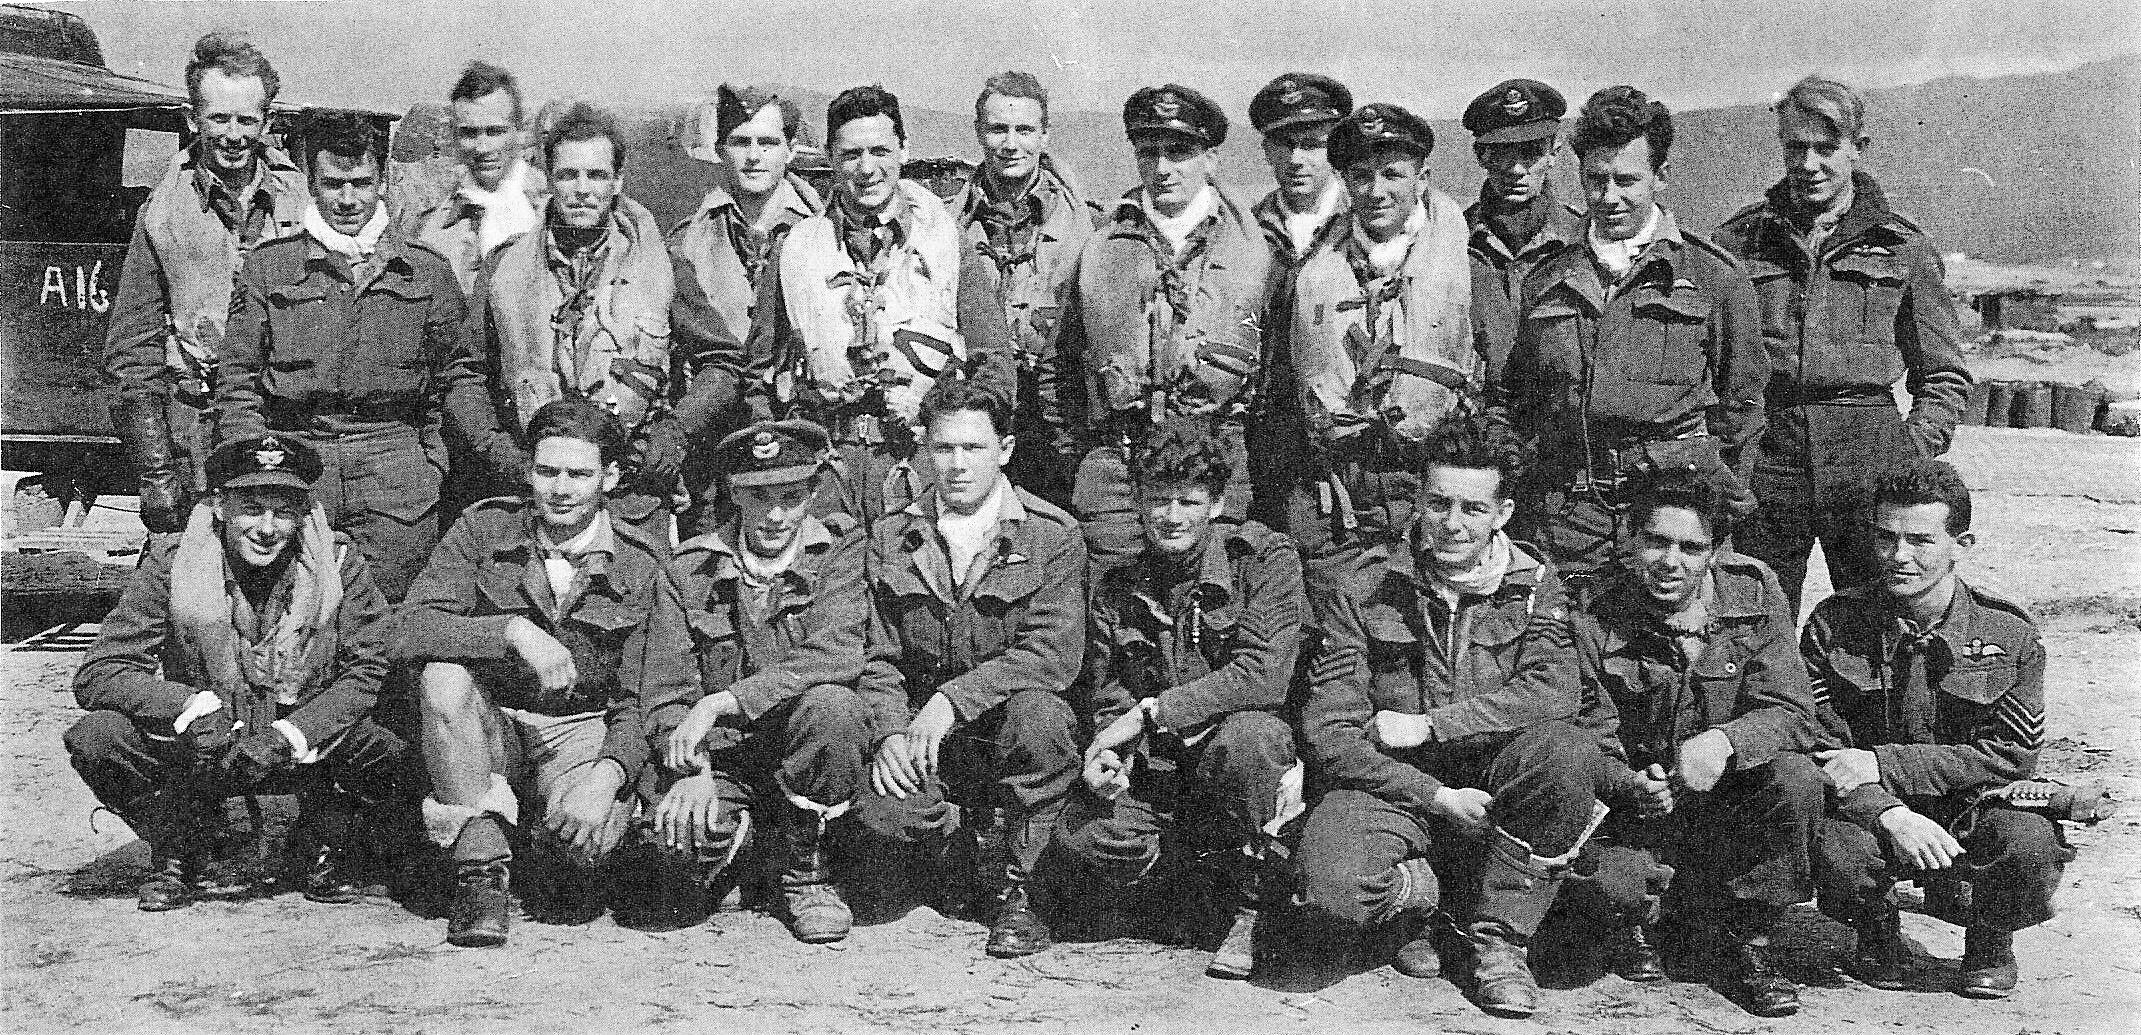 232 Squadron - Tingley, Algeria, North Africa, early 1943 MOD